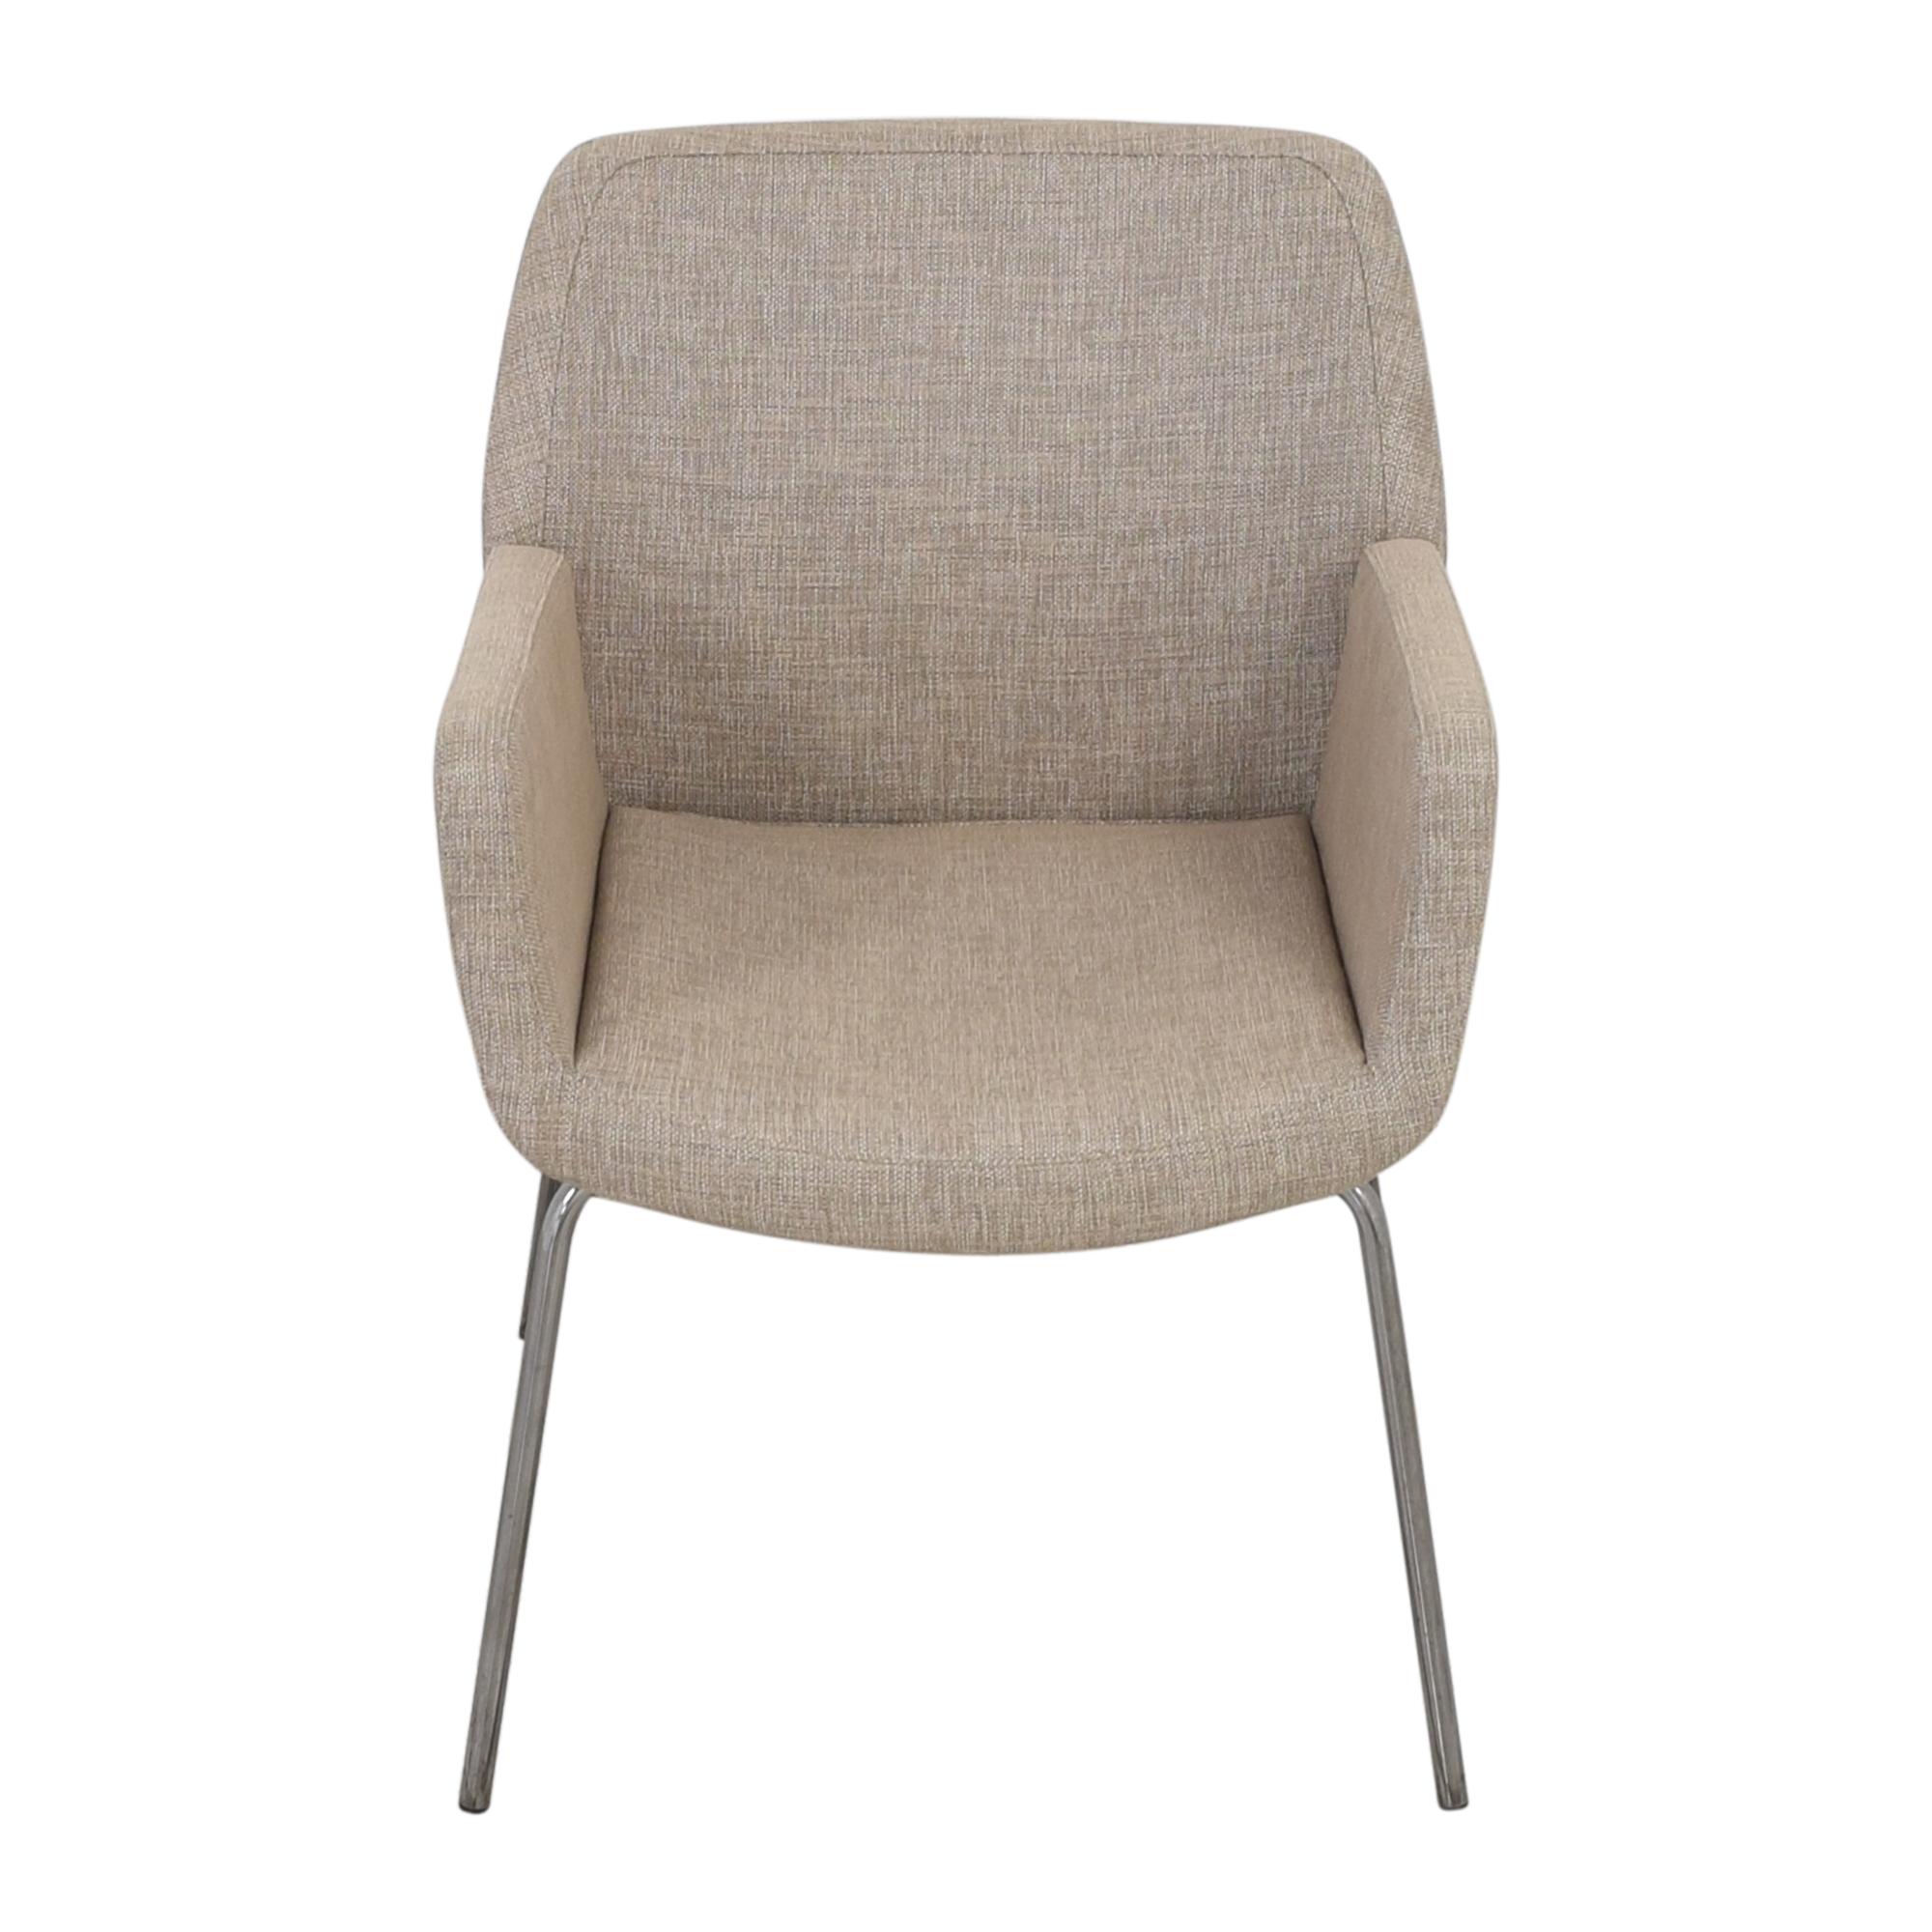 buy Steelcaase Coalesse Bindu Side Chair Steelcase Accent Chairs